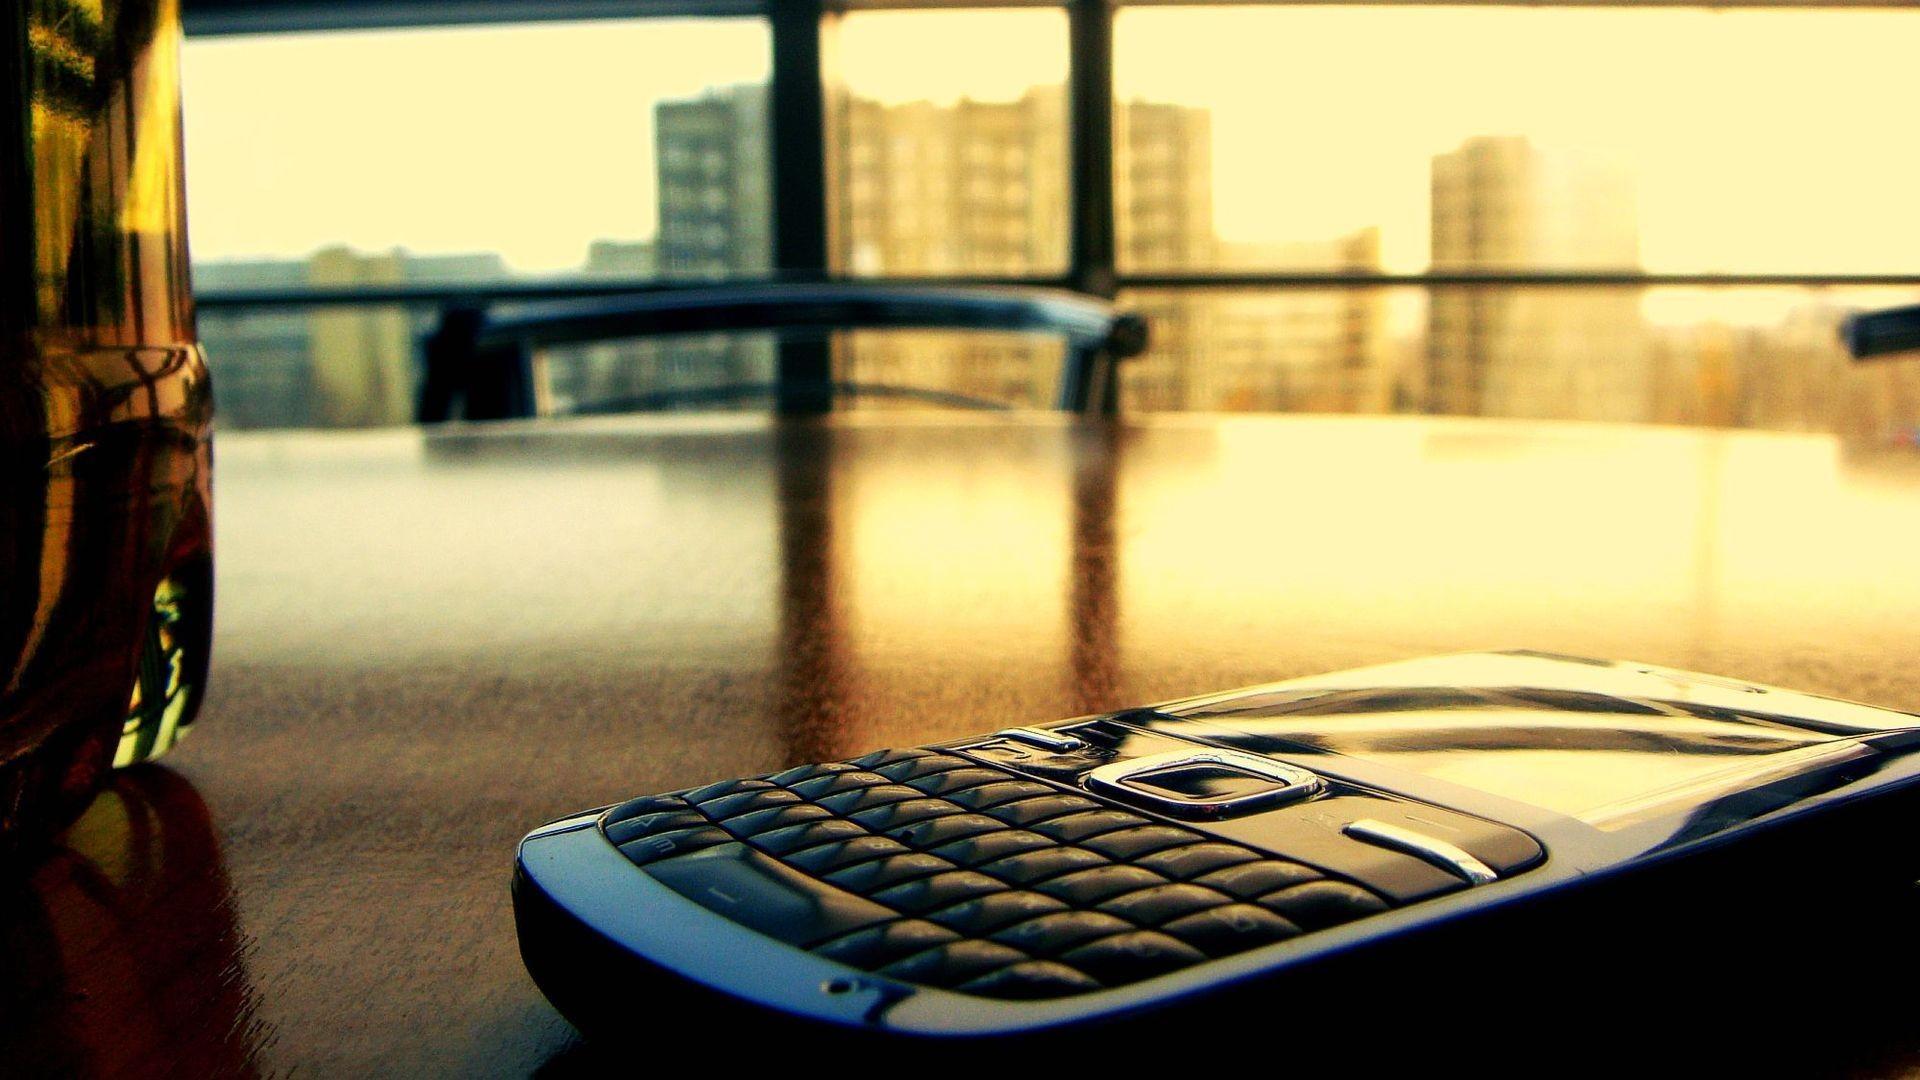 Download desktop wallpaper Photo smartphone on the desk in the office.